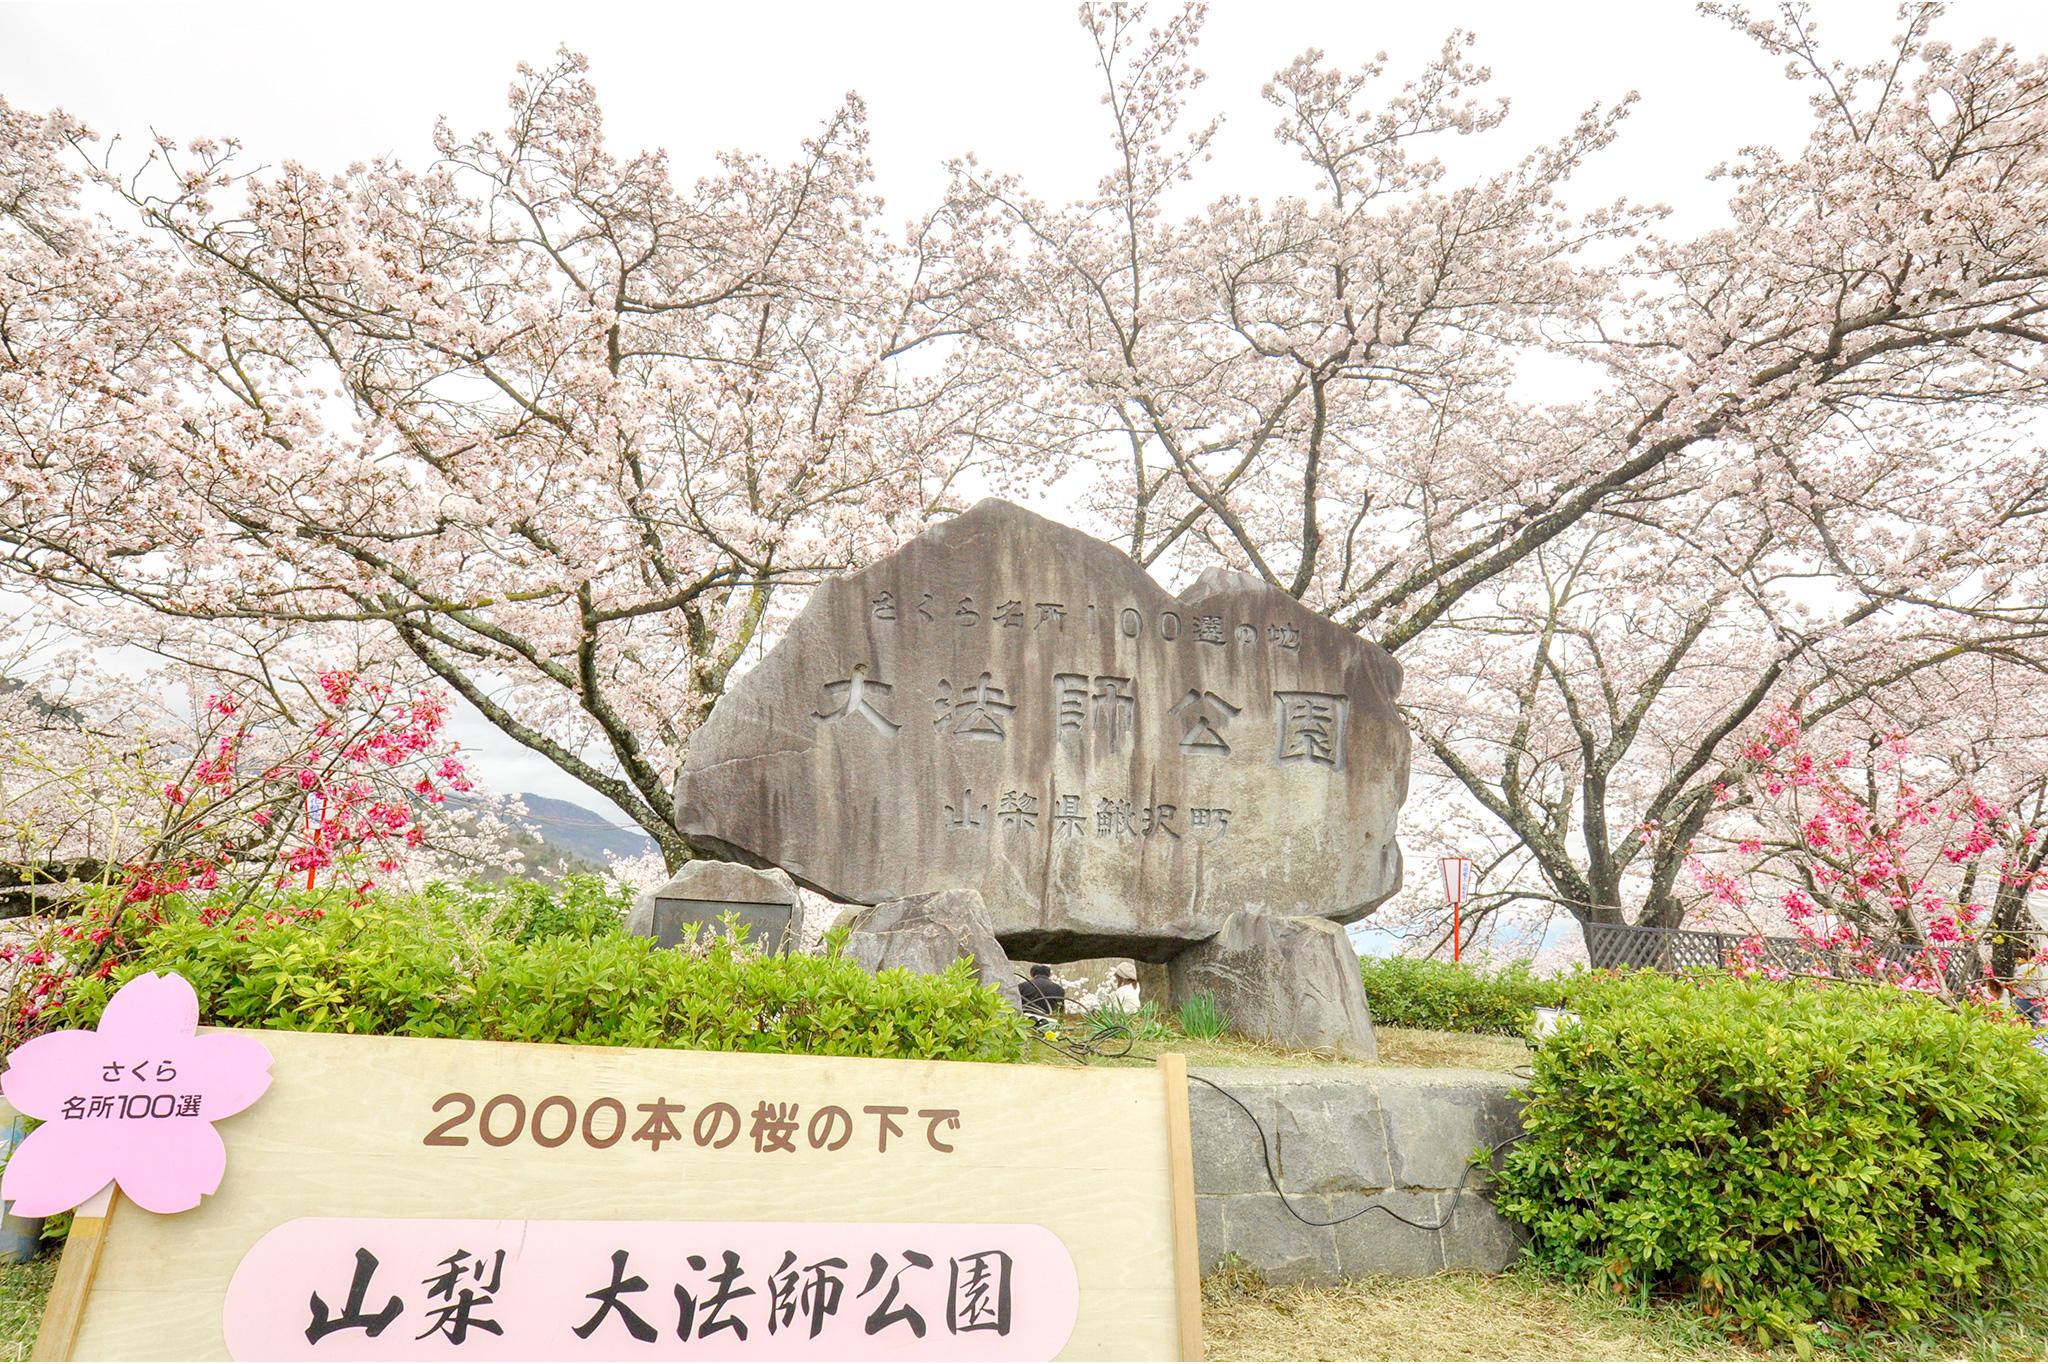 大法師公園の桜 写真1